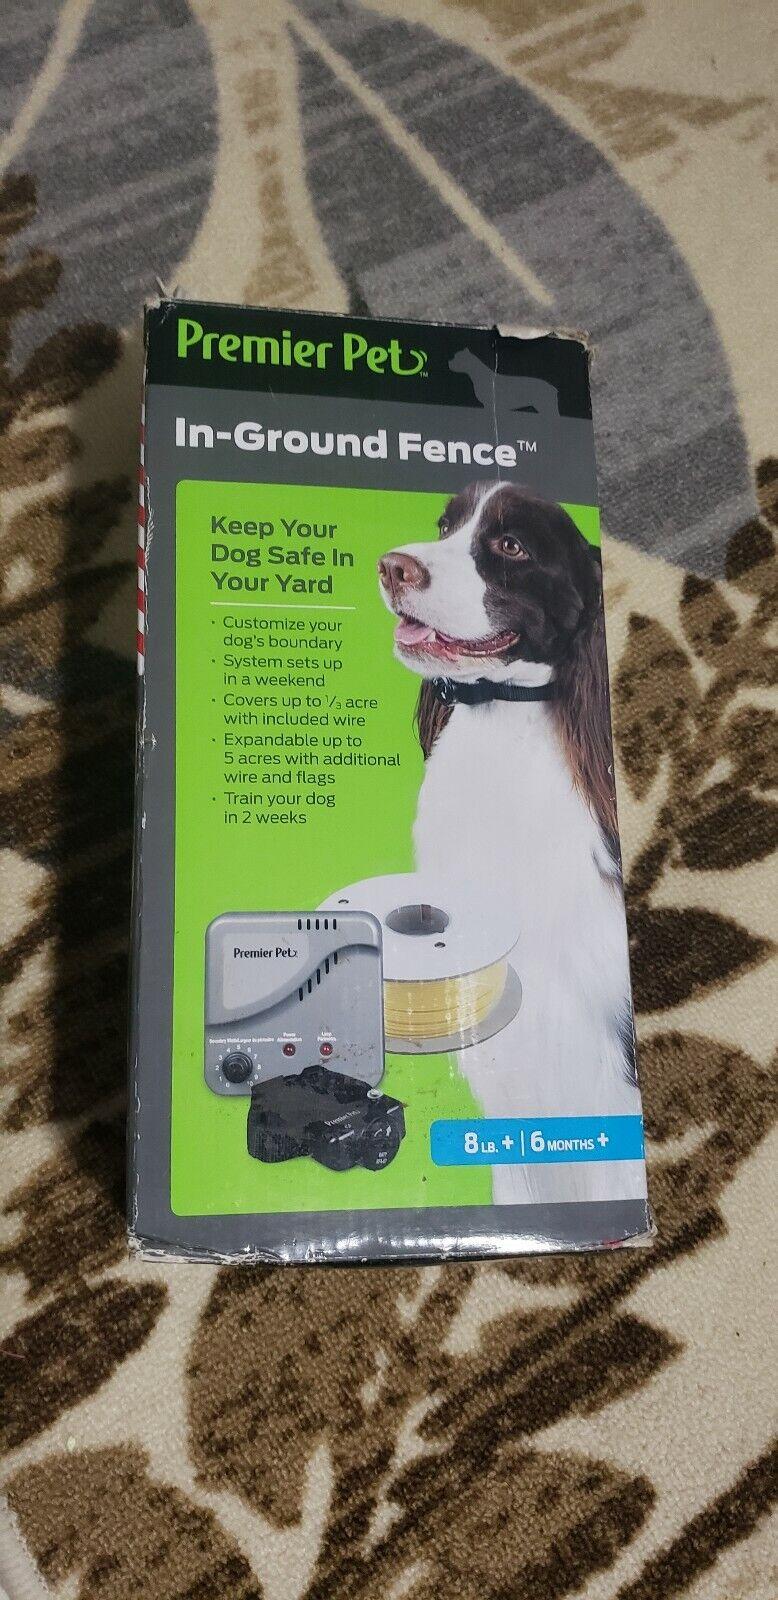 nuovo di marca Premier Pet GIG00-16349 In-Ground In-Ground In-Ground Fence System BRAND NEW Open Box  alta qualità